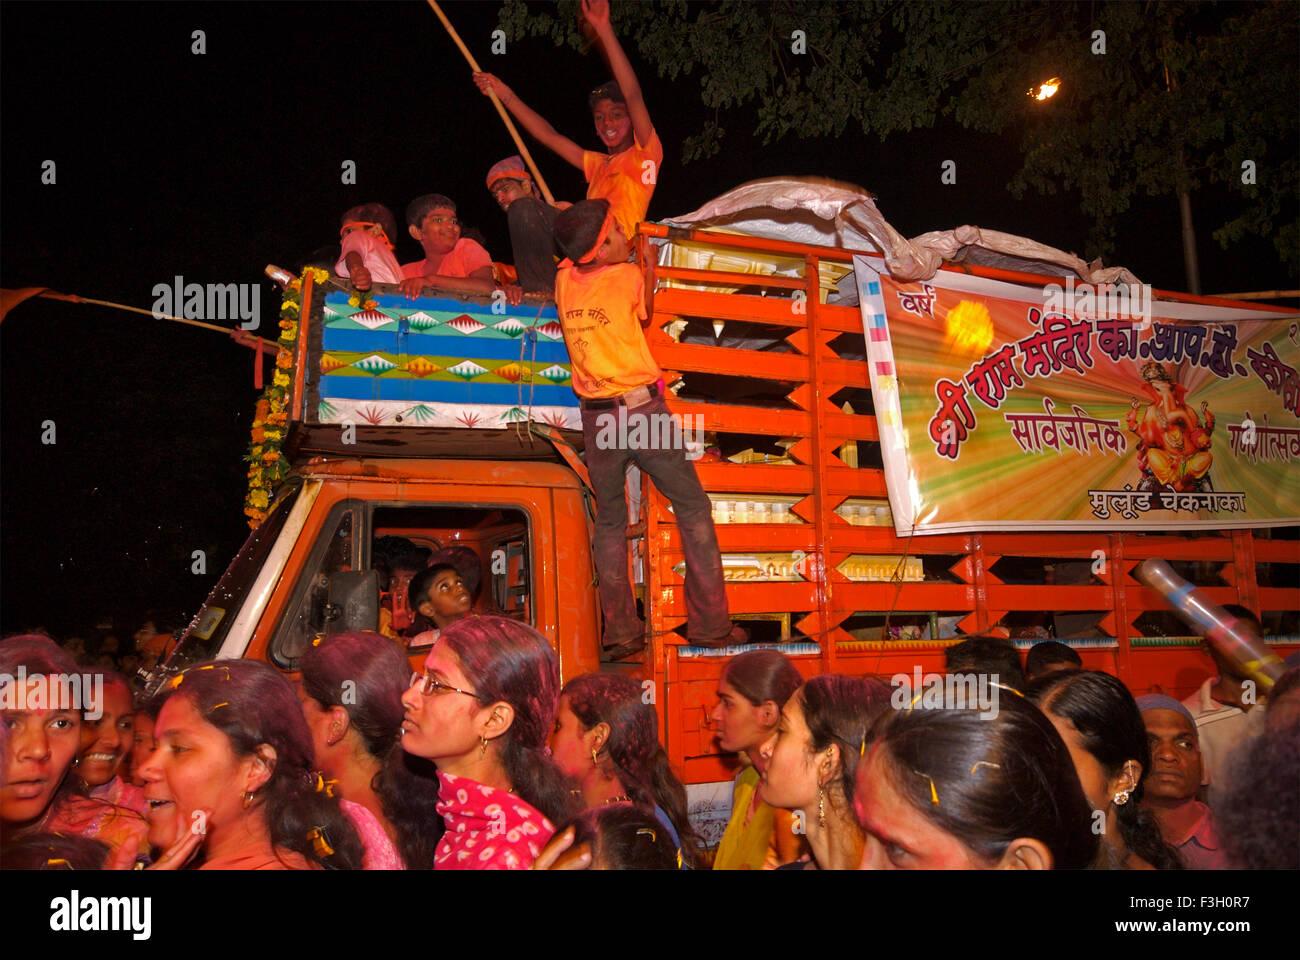 Women walking past a truck at ganesh visarjan - Stock Image